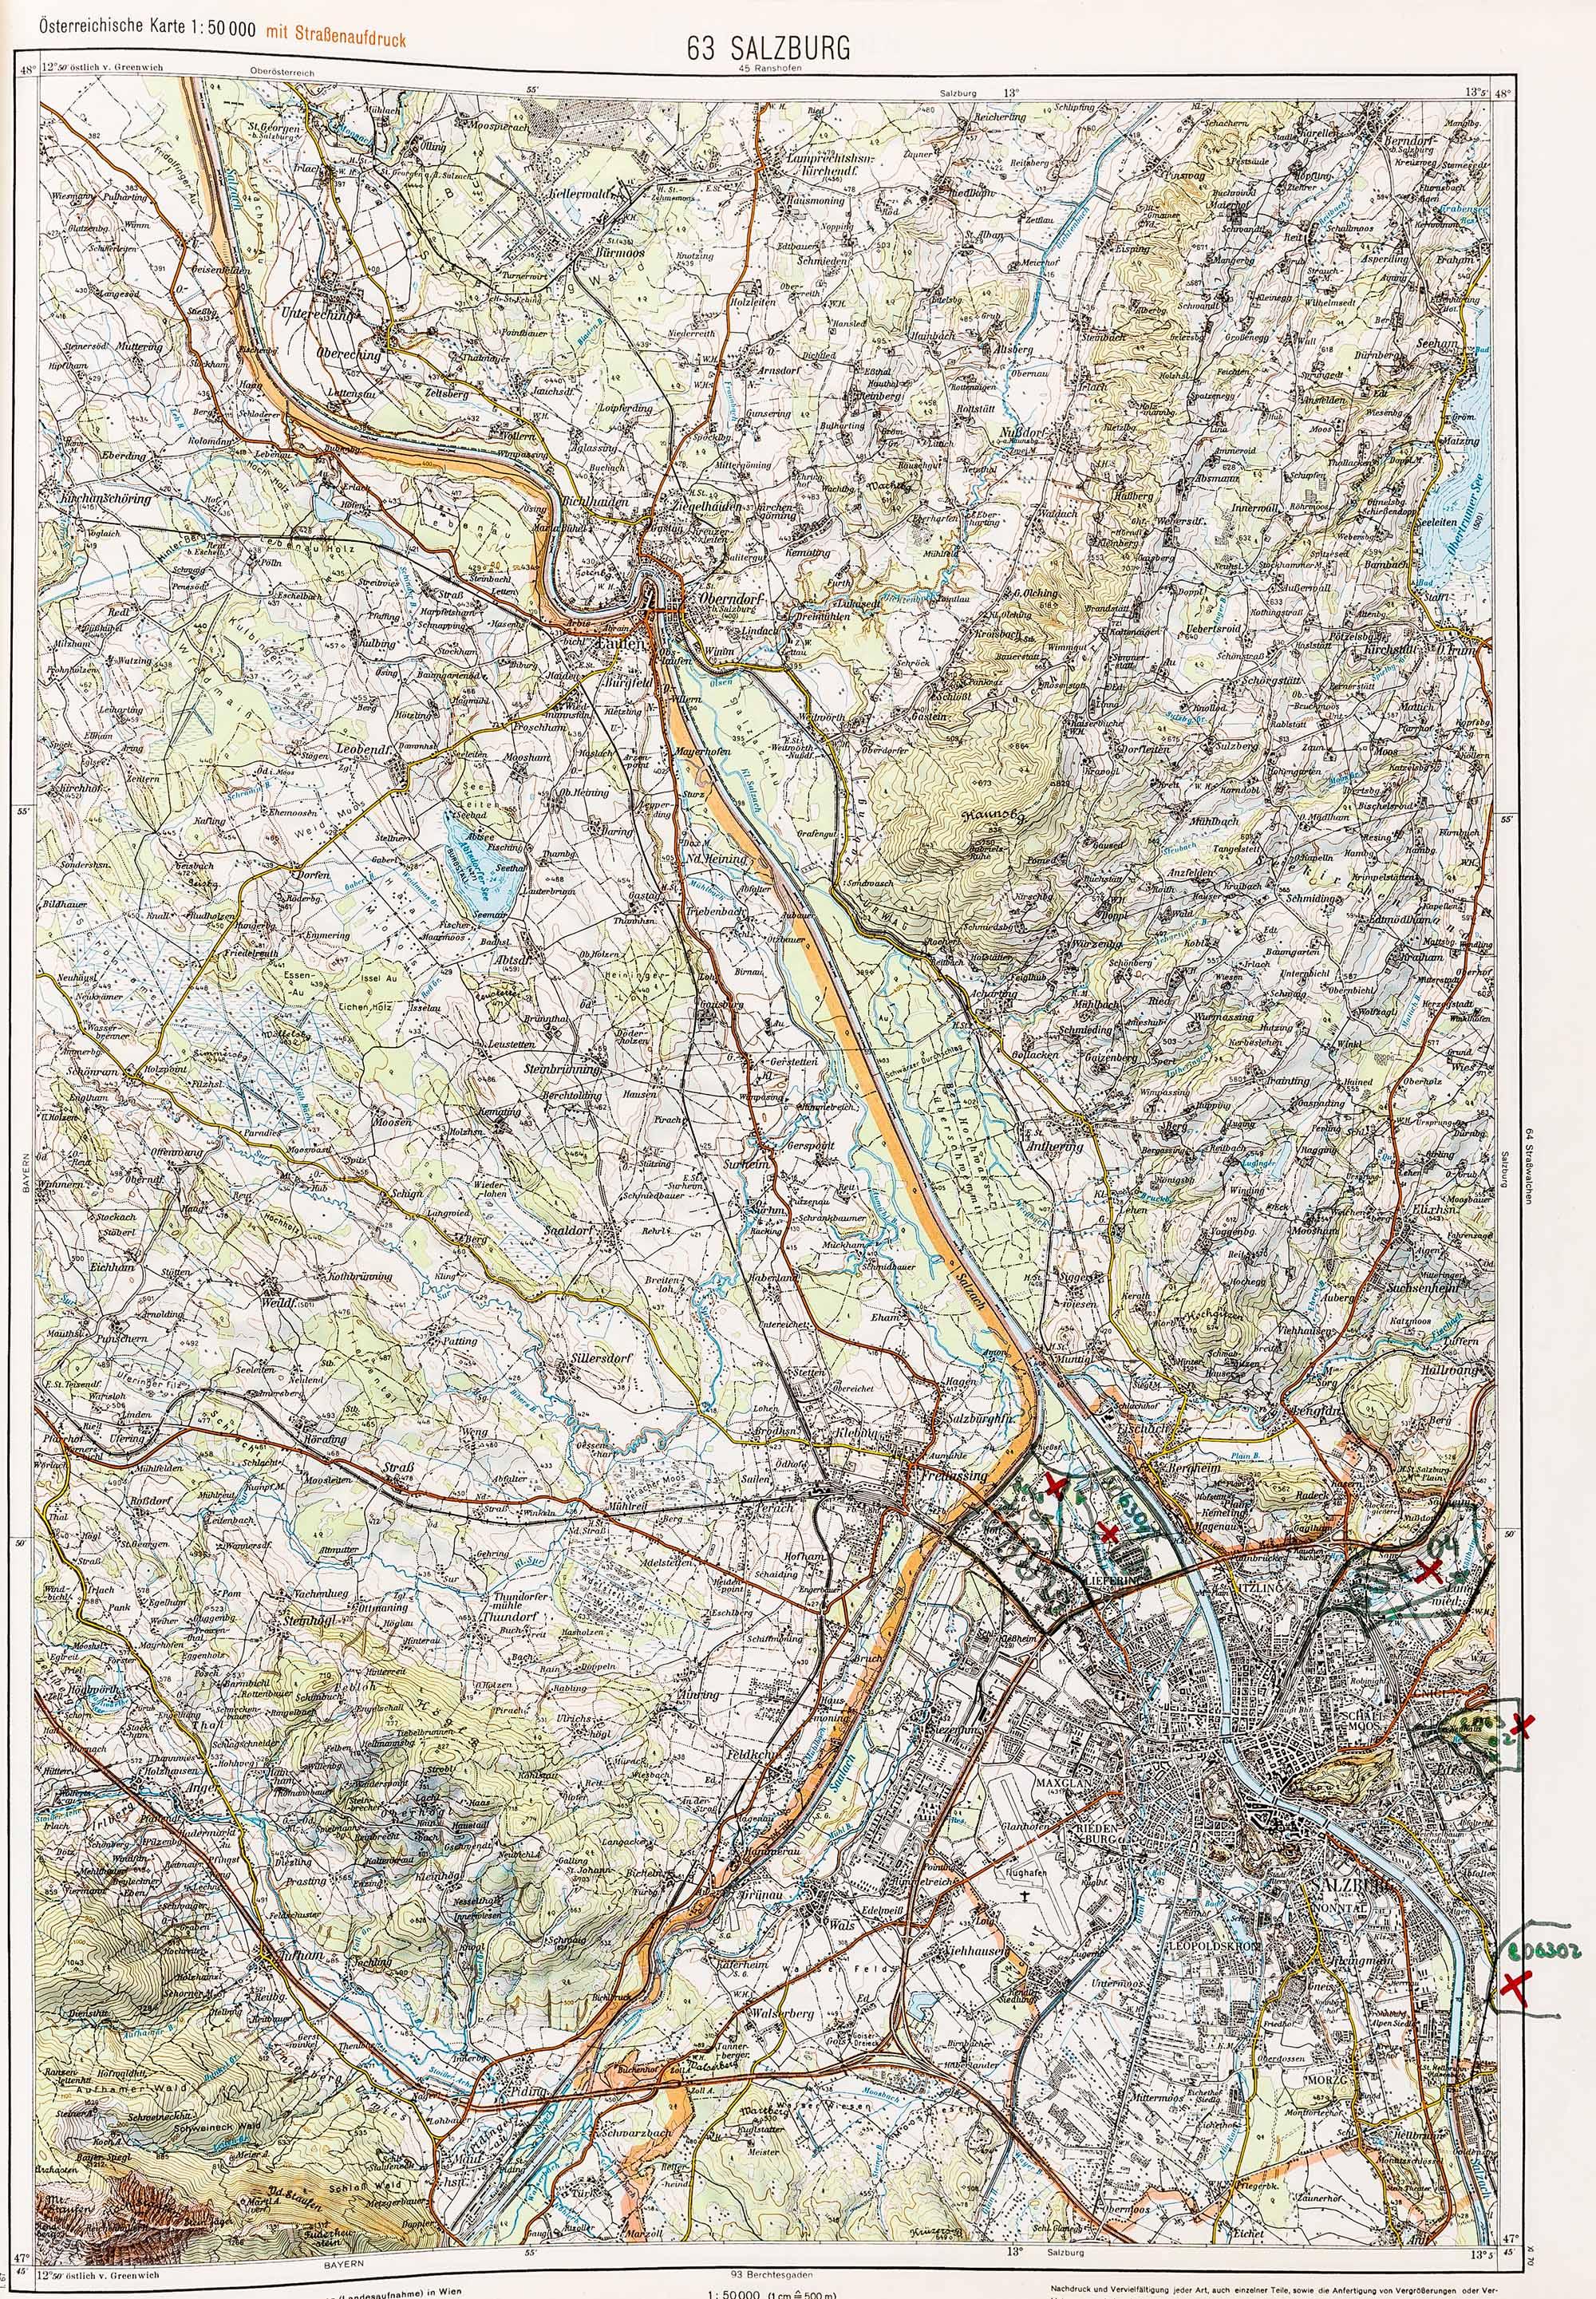 1975-1979 Karte 063